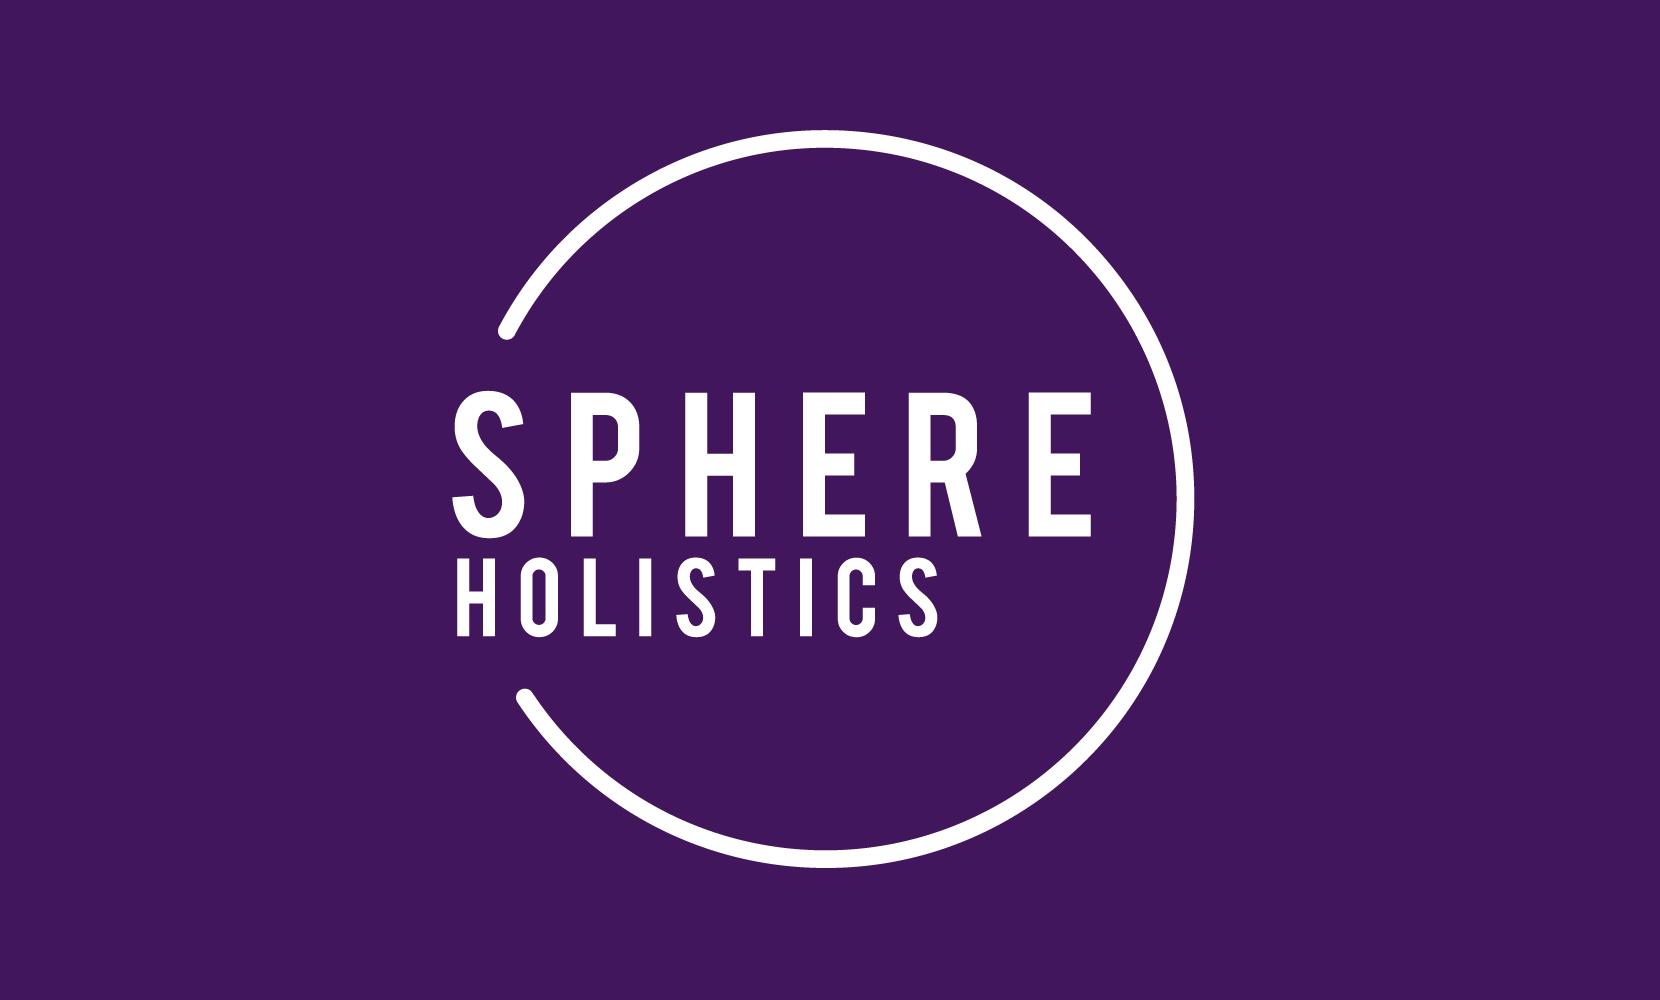 Brand New – Sphere Holistics